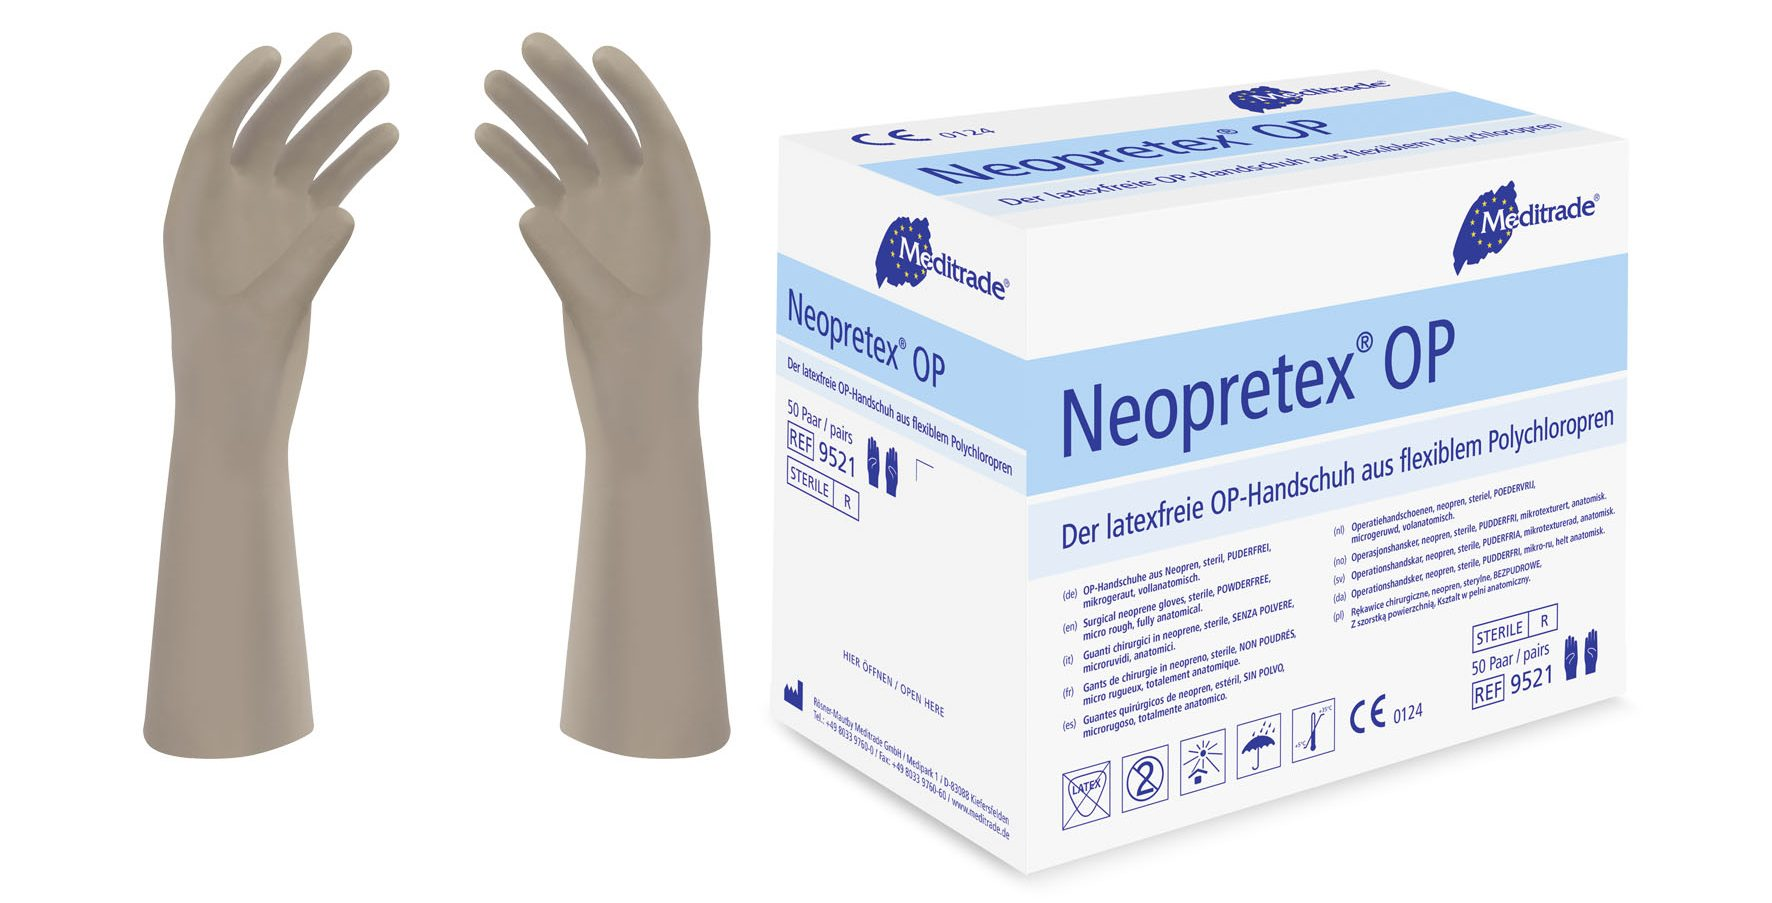 Neopretex® OP, Handschuhe aus Polychloropren